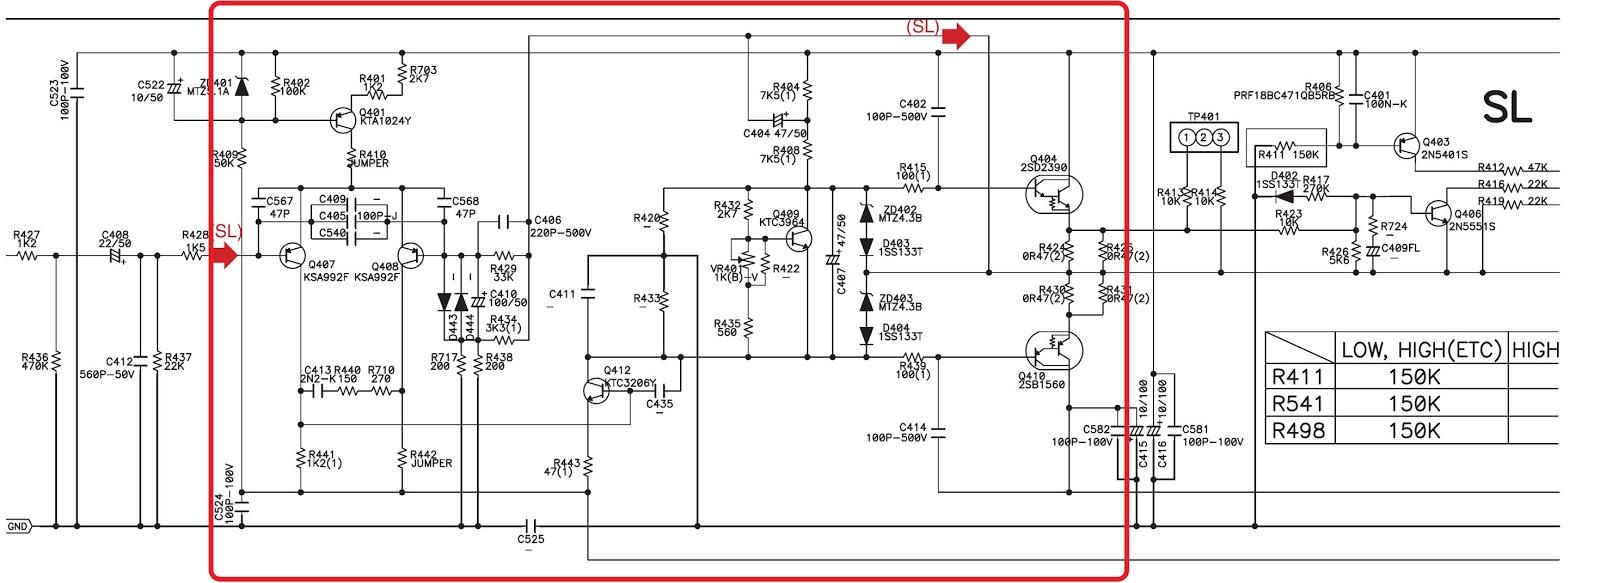 crt monitor circuit diagram free download ggetwaves. Black Bedroom Furniture Sets. Home Design Ideas